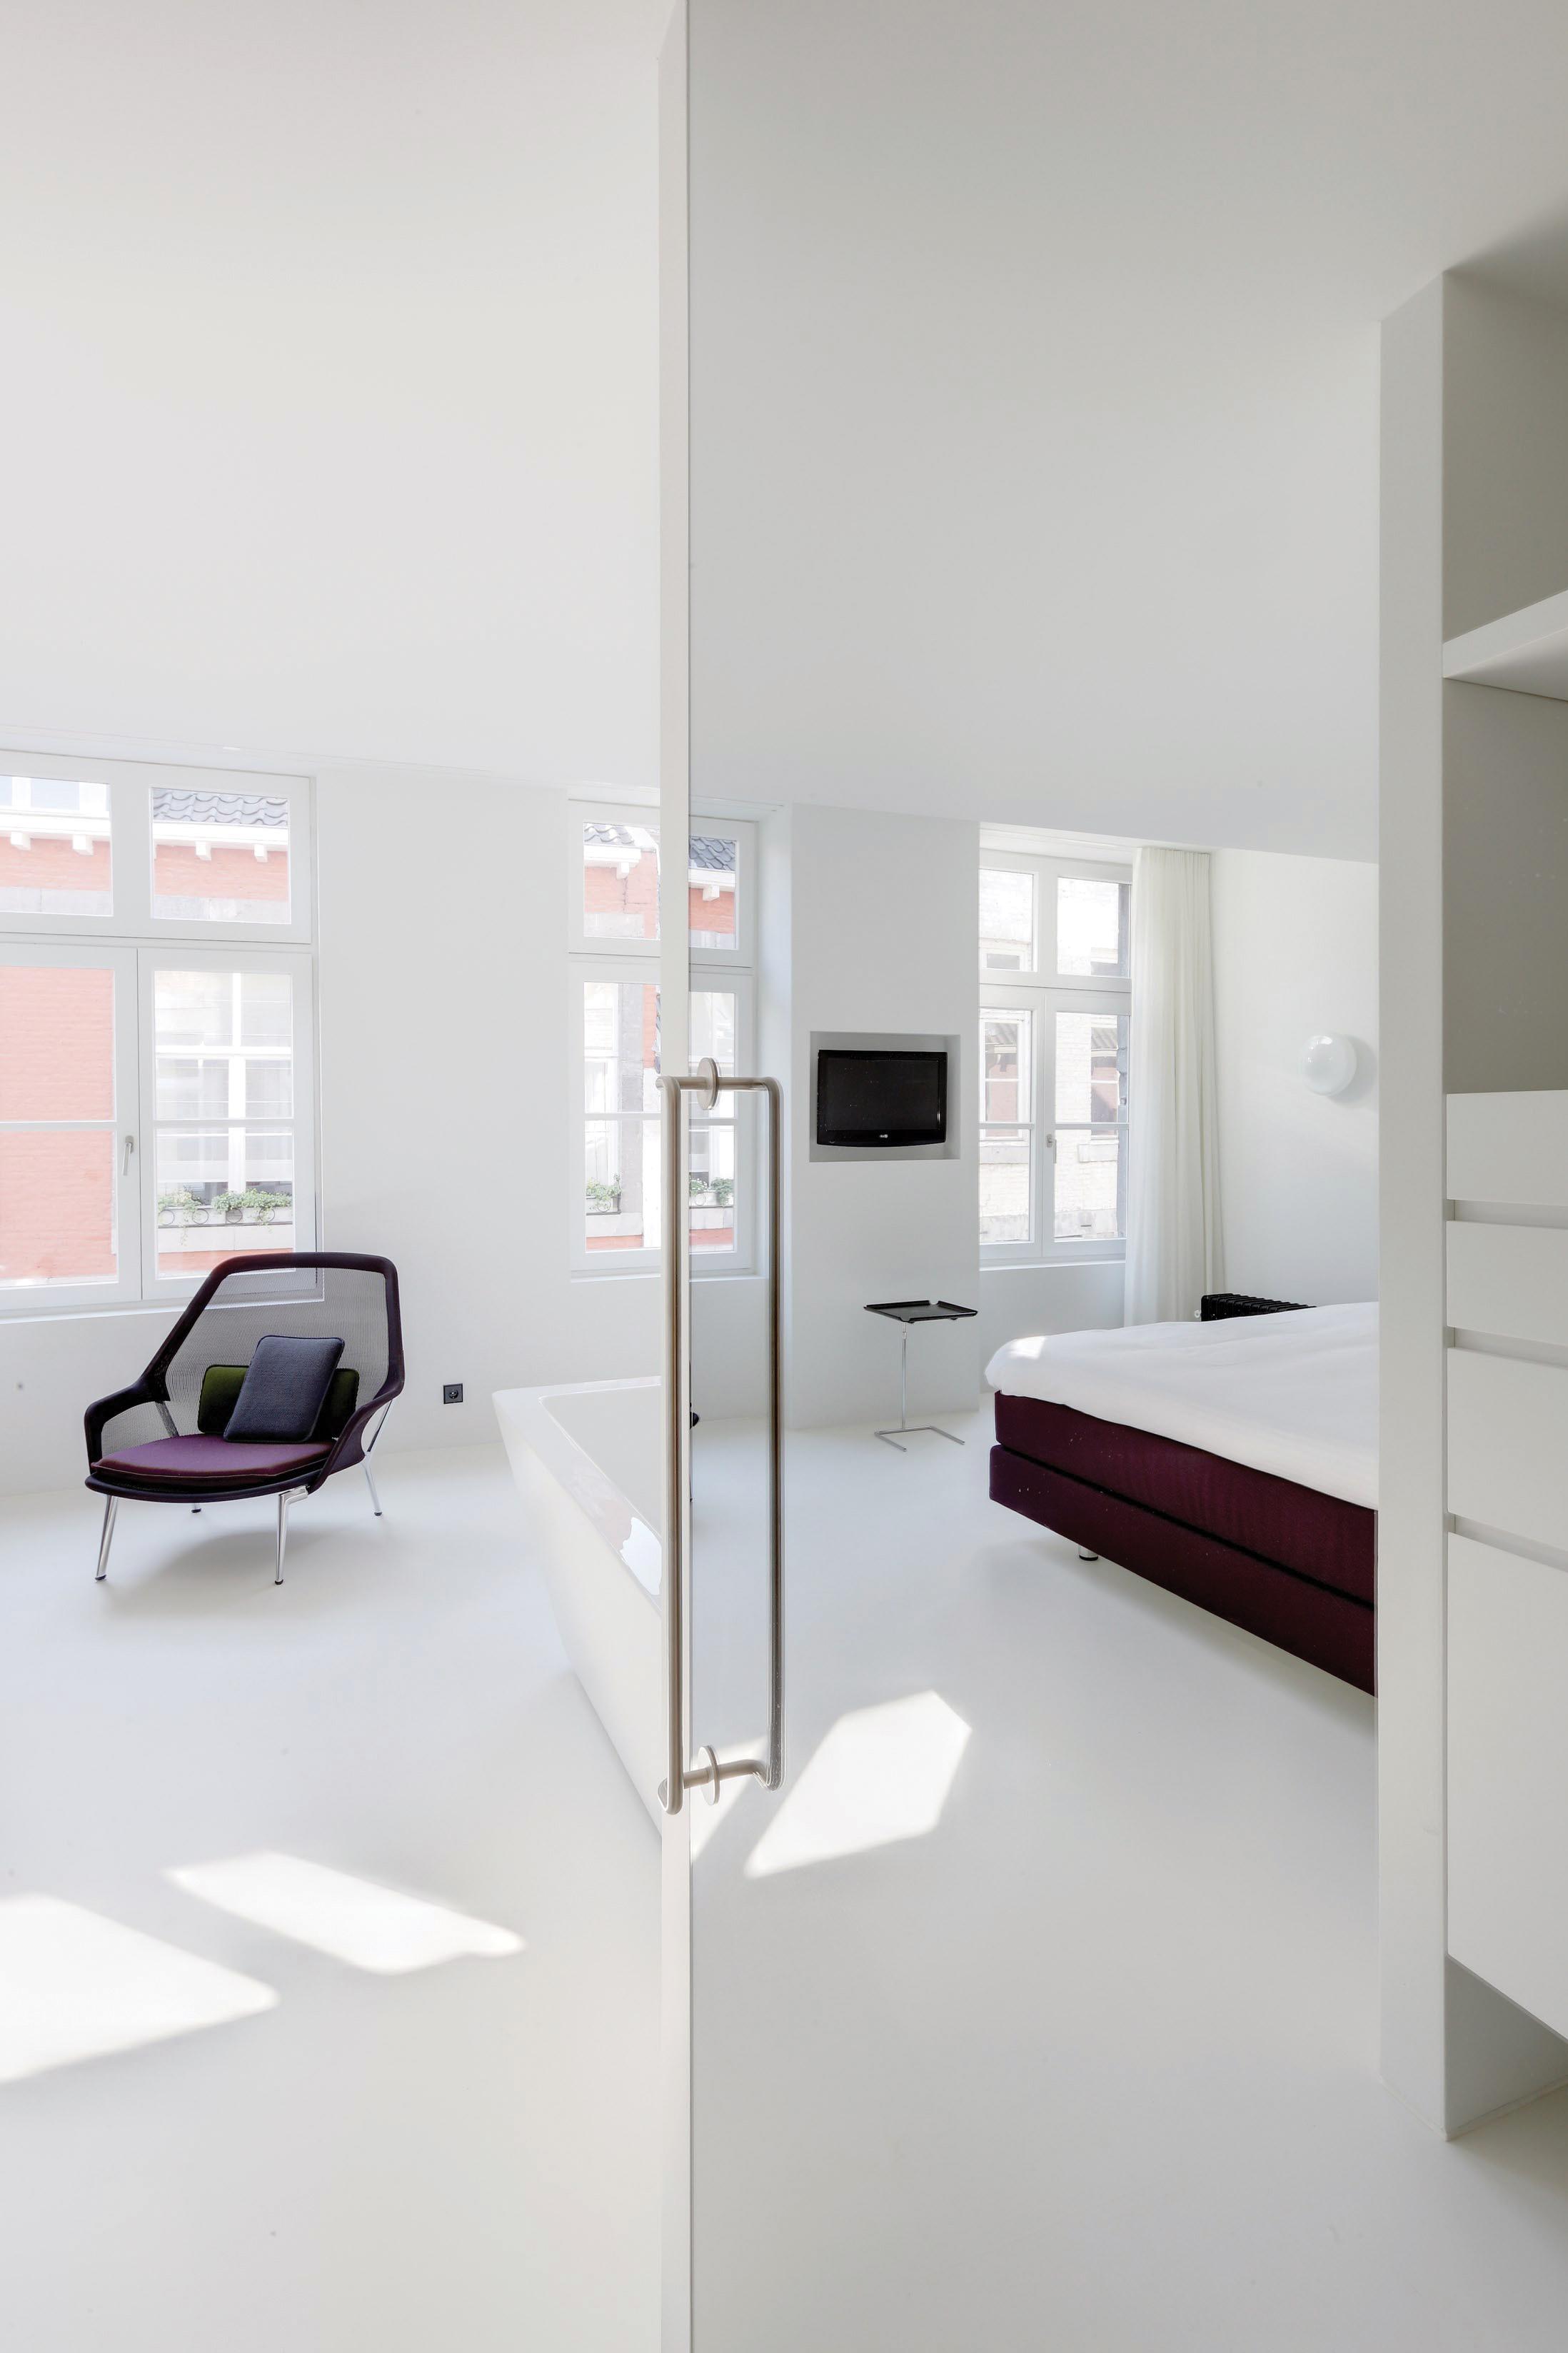 Zenden foto album hotel zenden designhotel maastricht for Designhotel maastricht